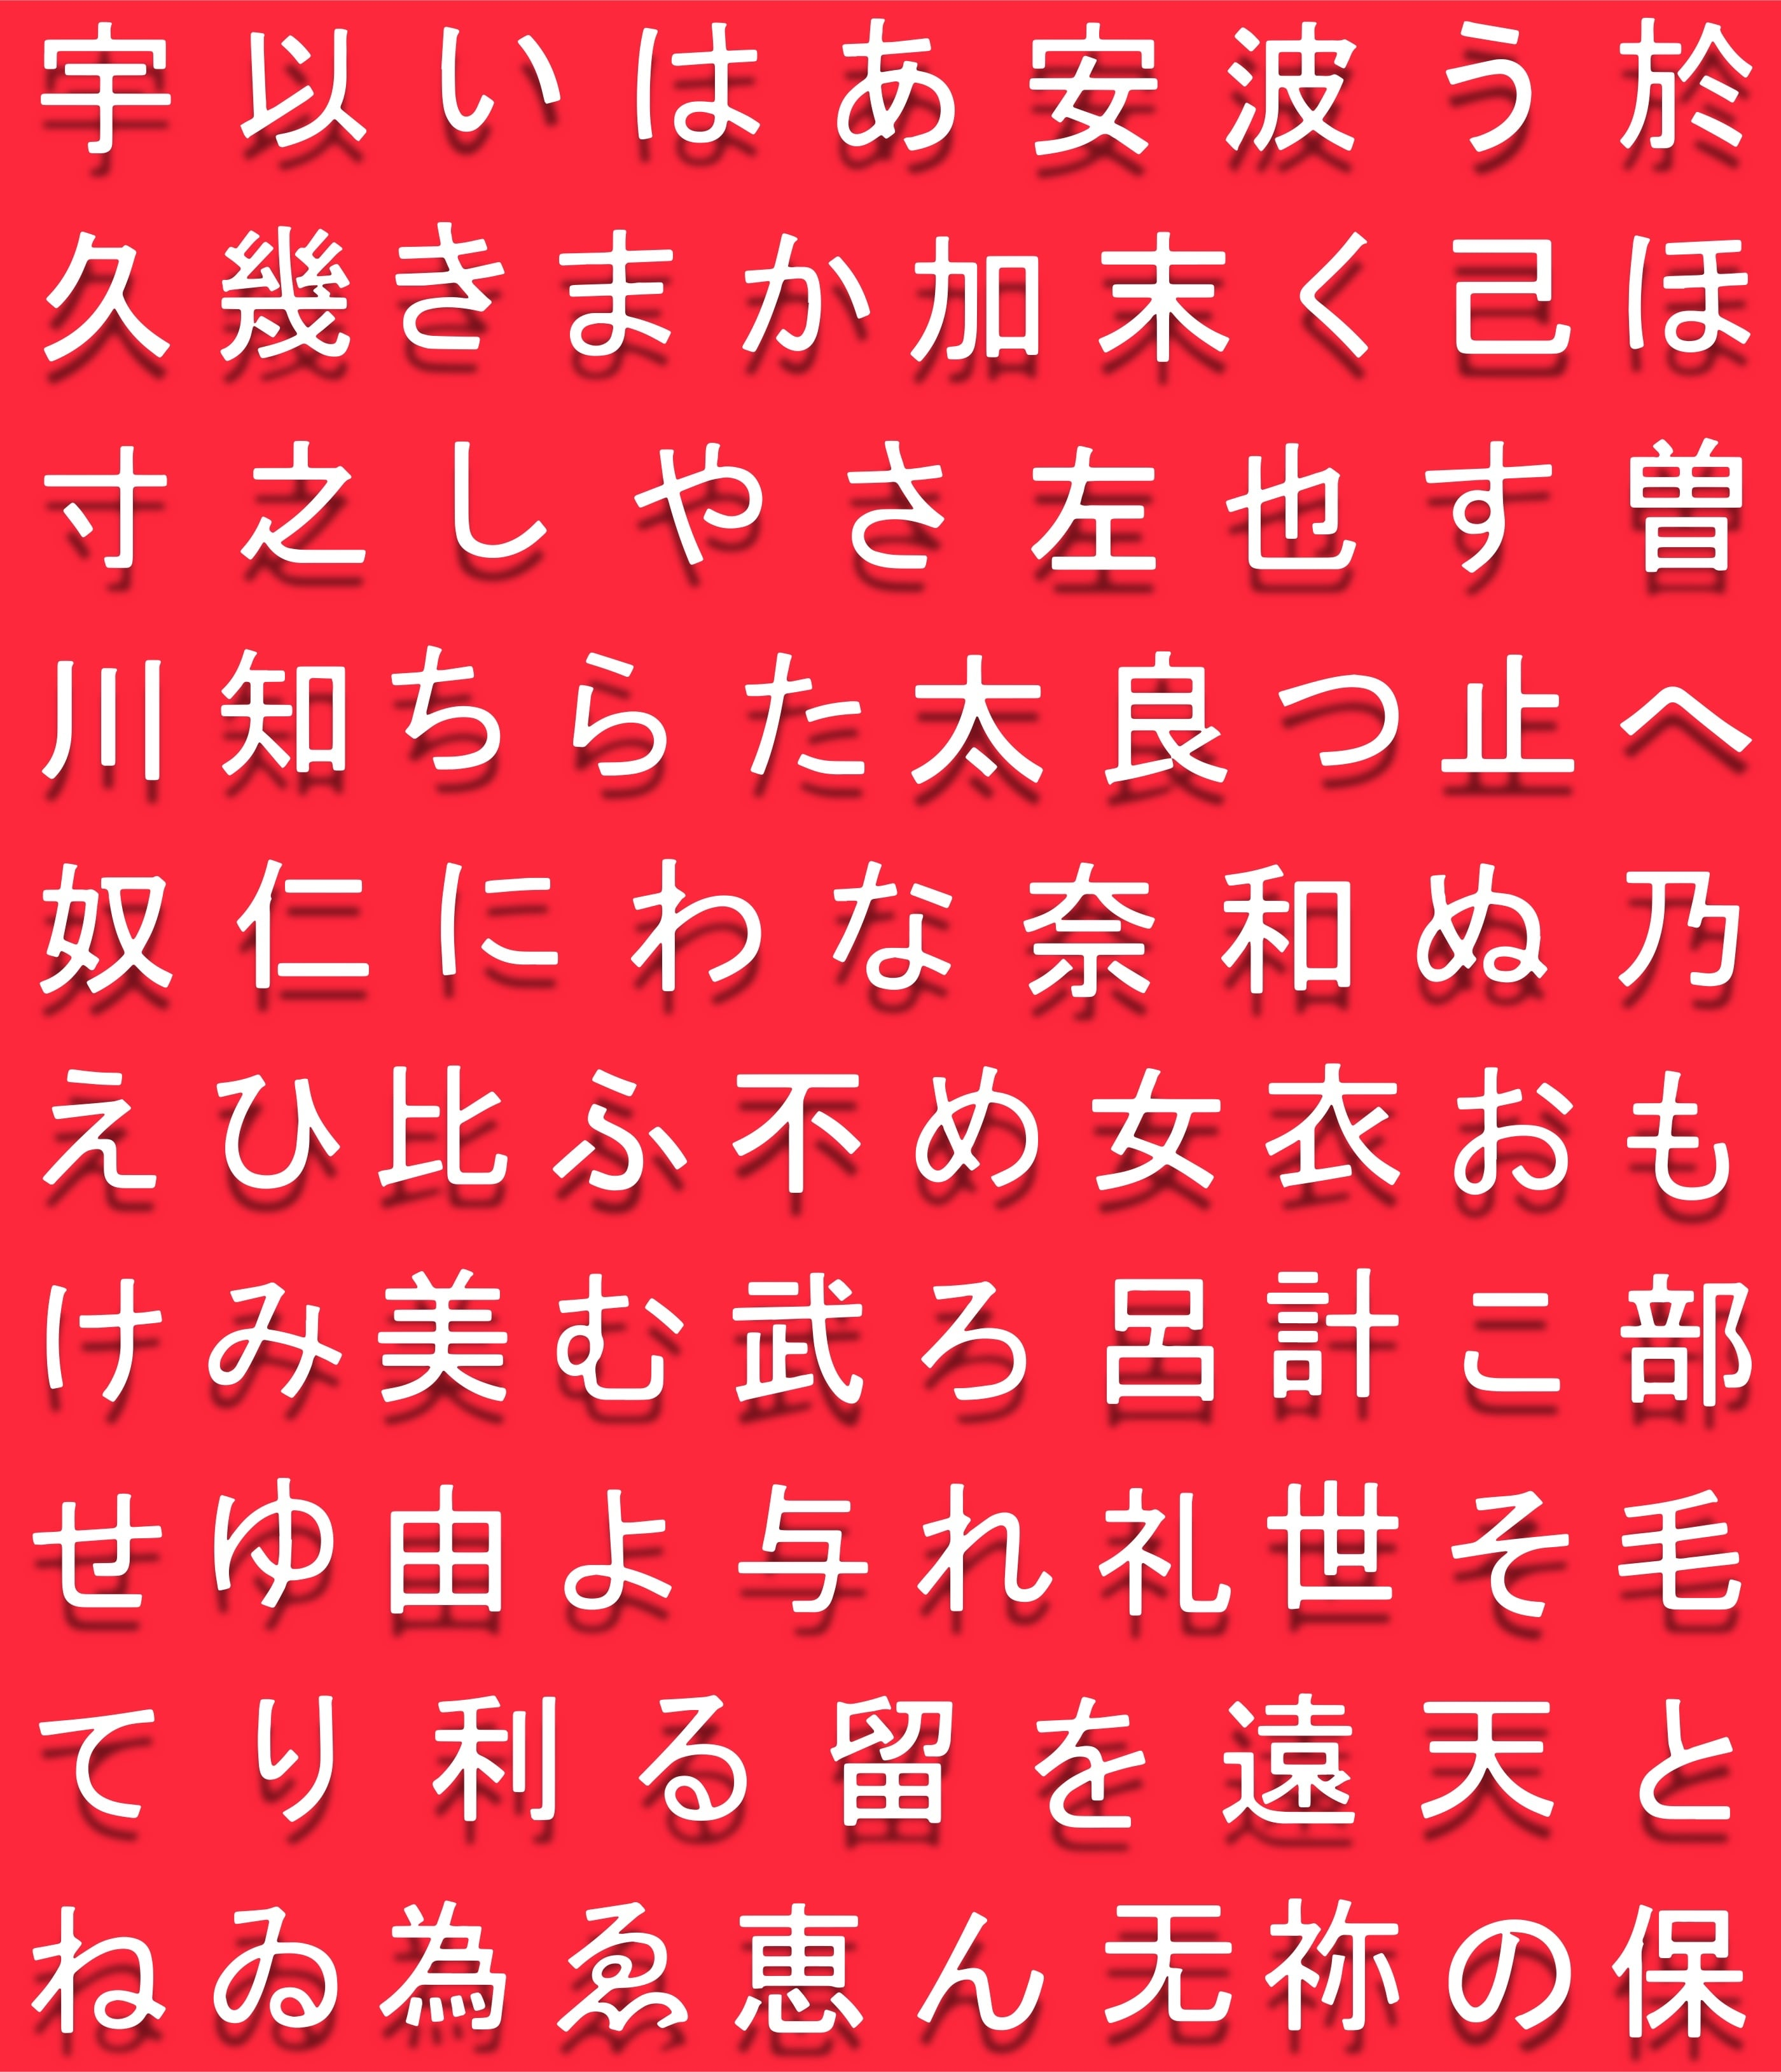 Japanese Kanji Alphabet Chart